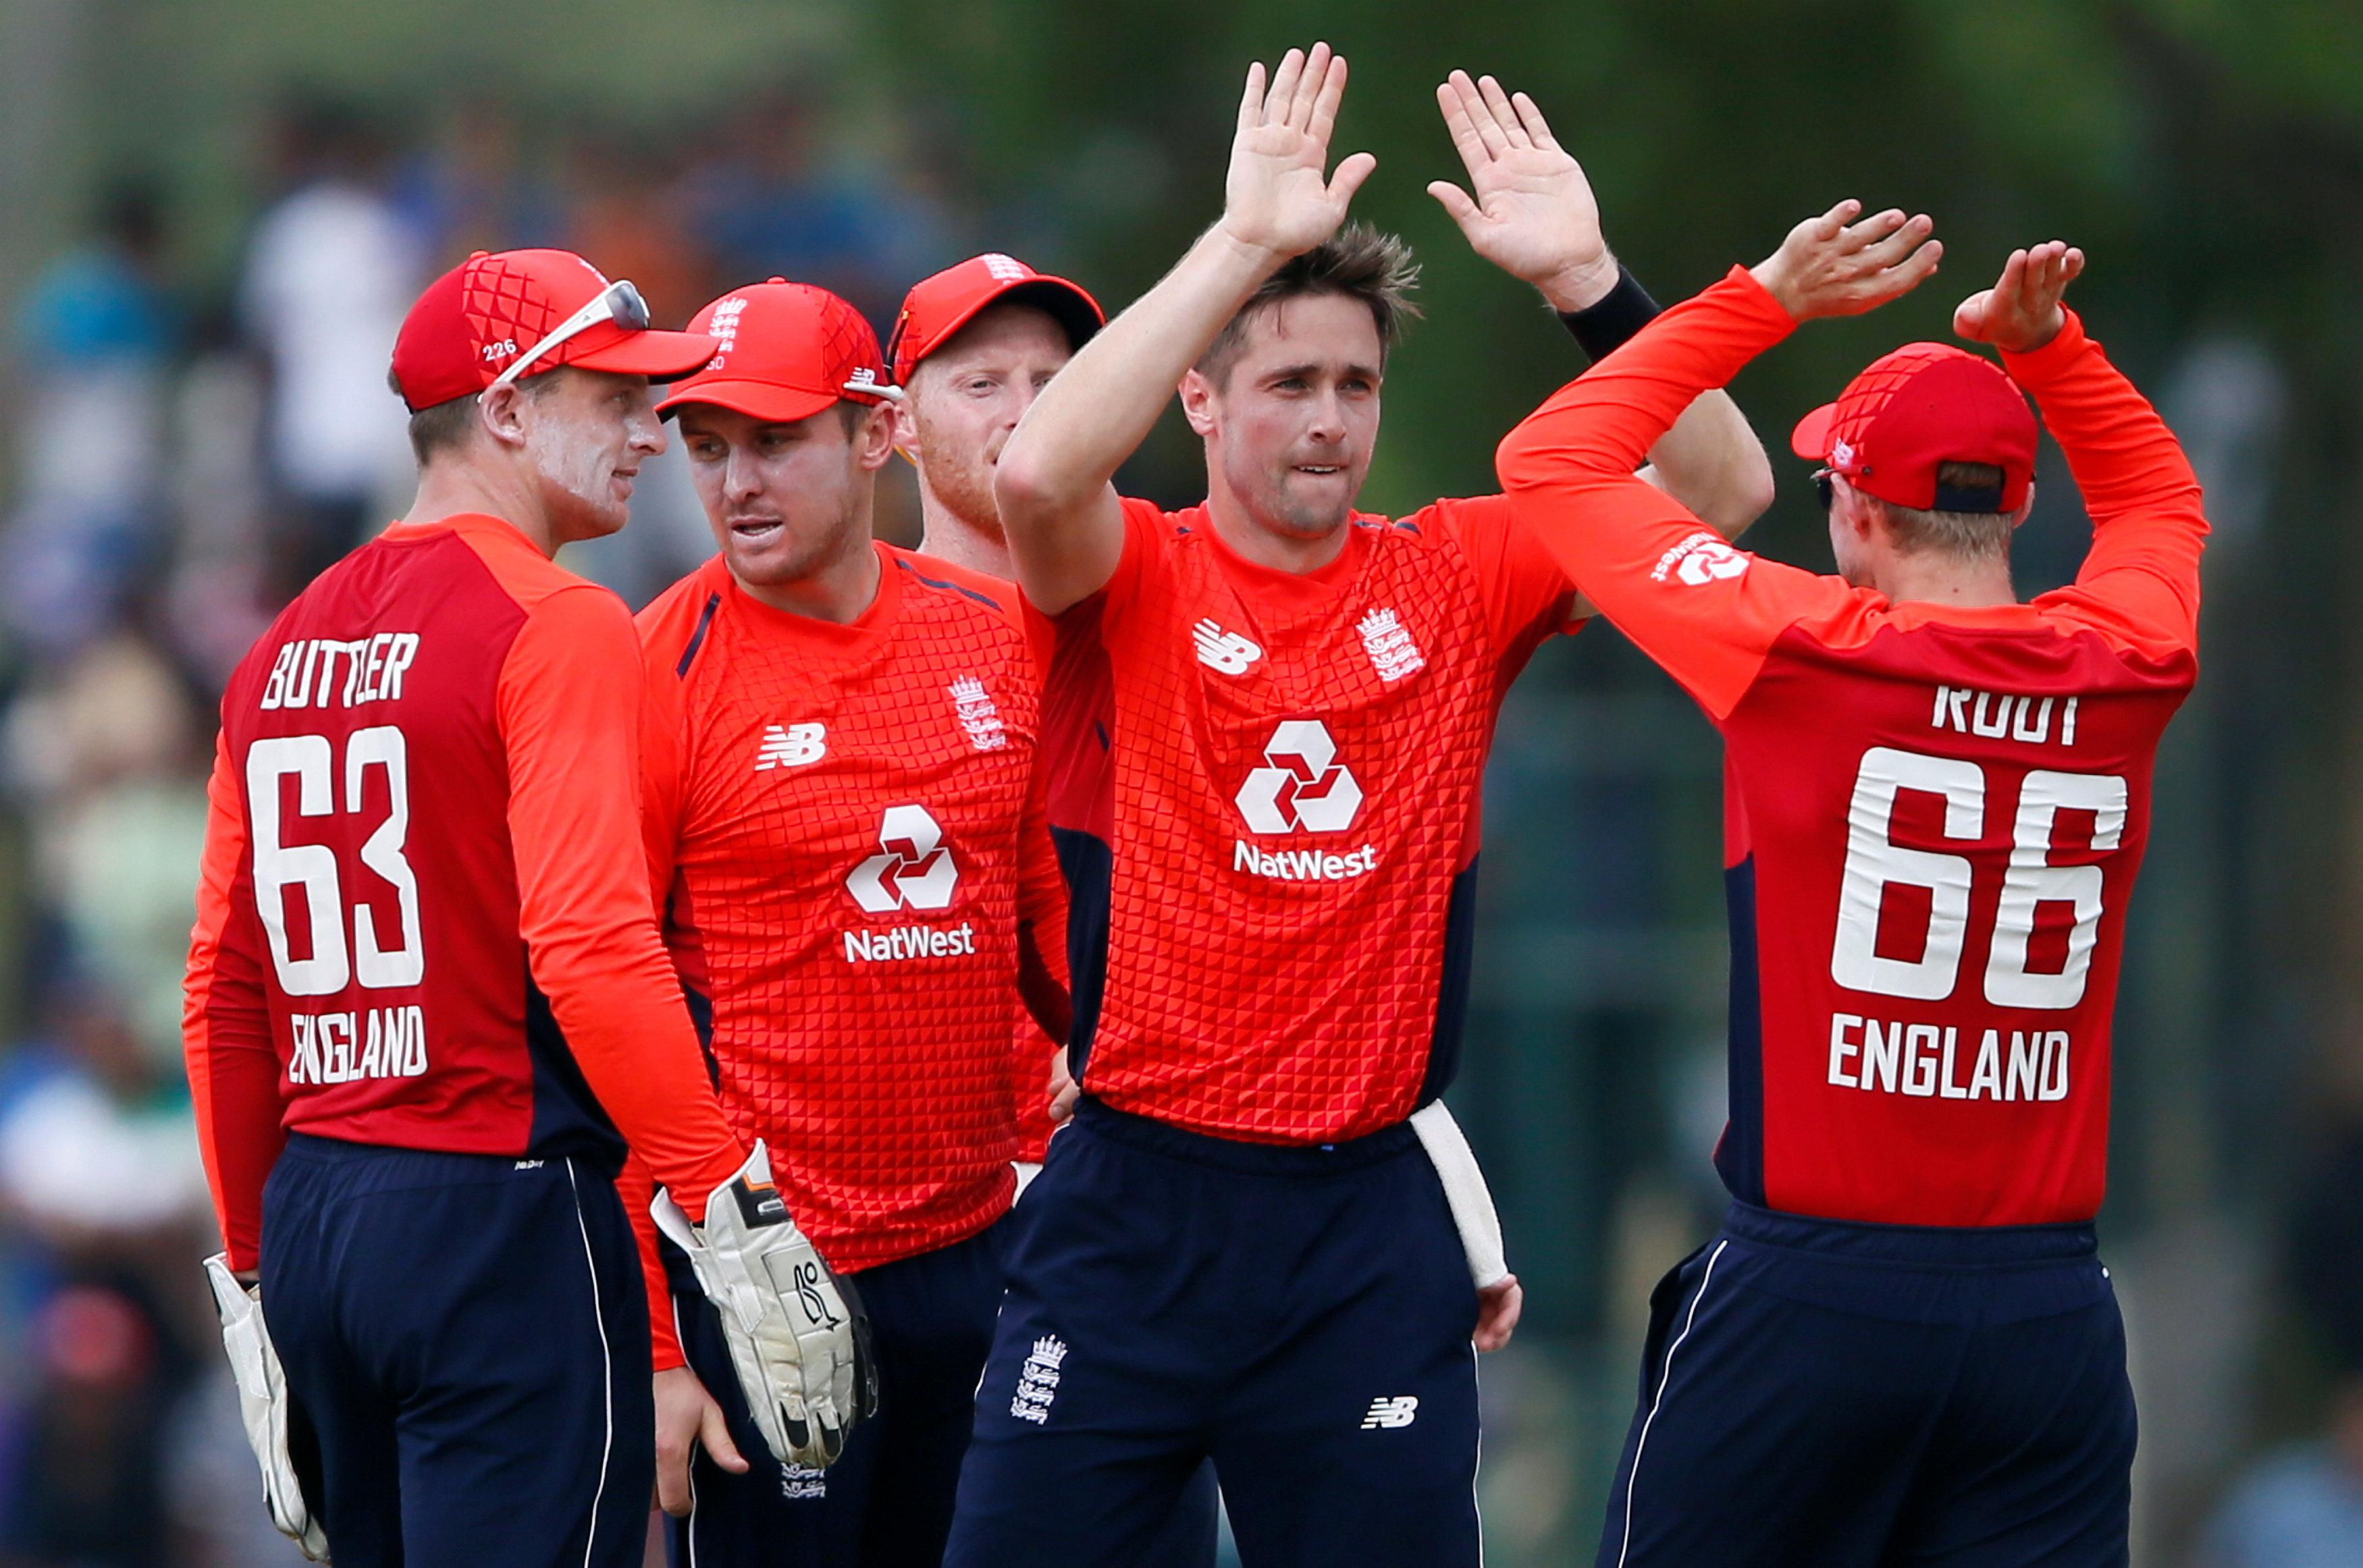 Cricket: England's Woakes sinks Sri Lanka in rain-marred ODI